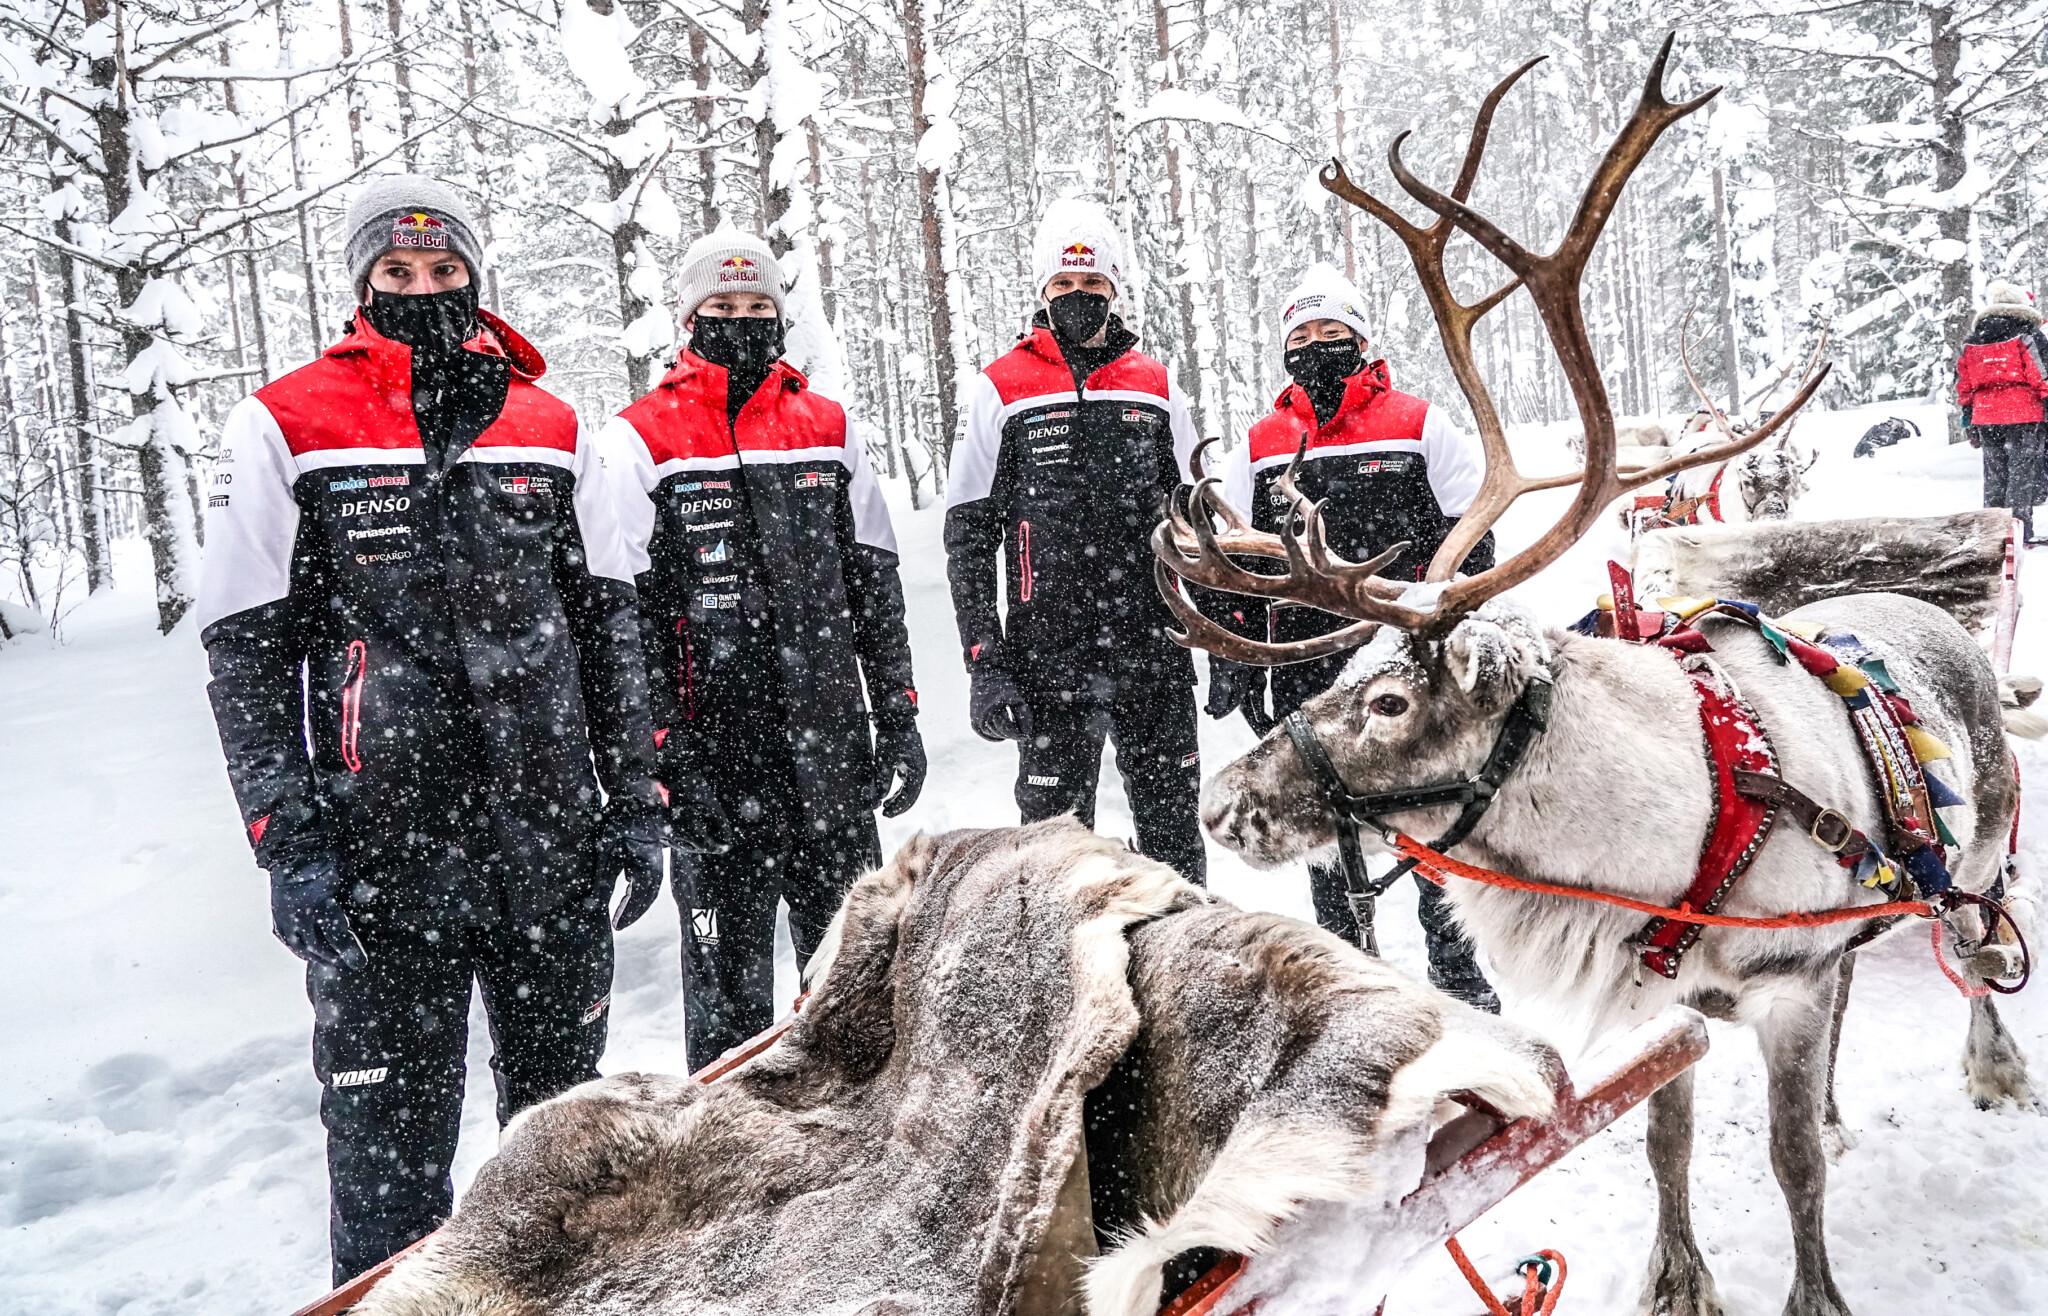 Arctic Rally Finland Team Toyota